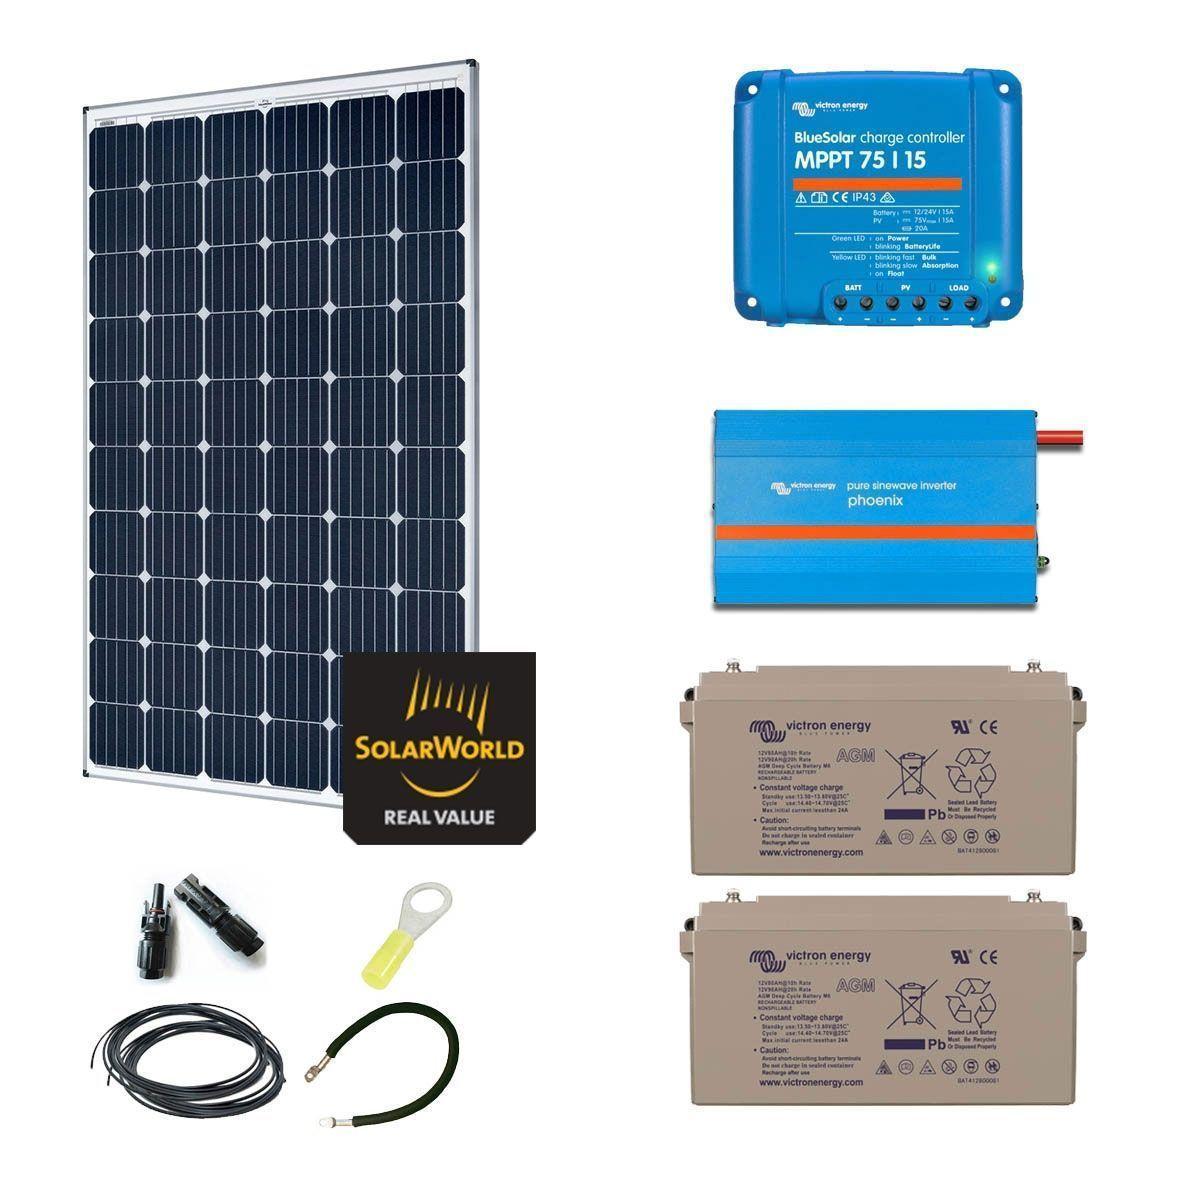 kit solaire 300w autonome convertisseur 230v 375va. Black Bedroom Furniture Sets. Home Design Ideas